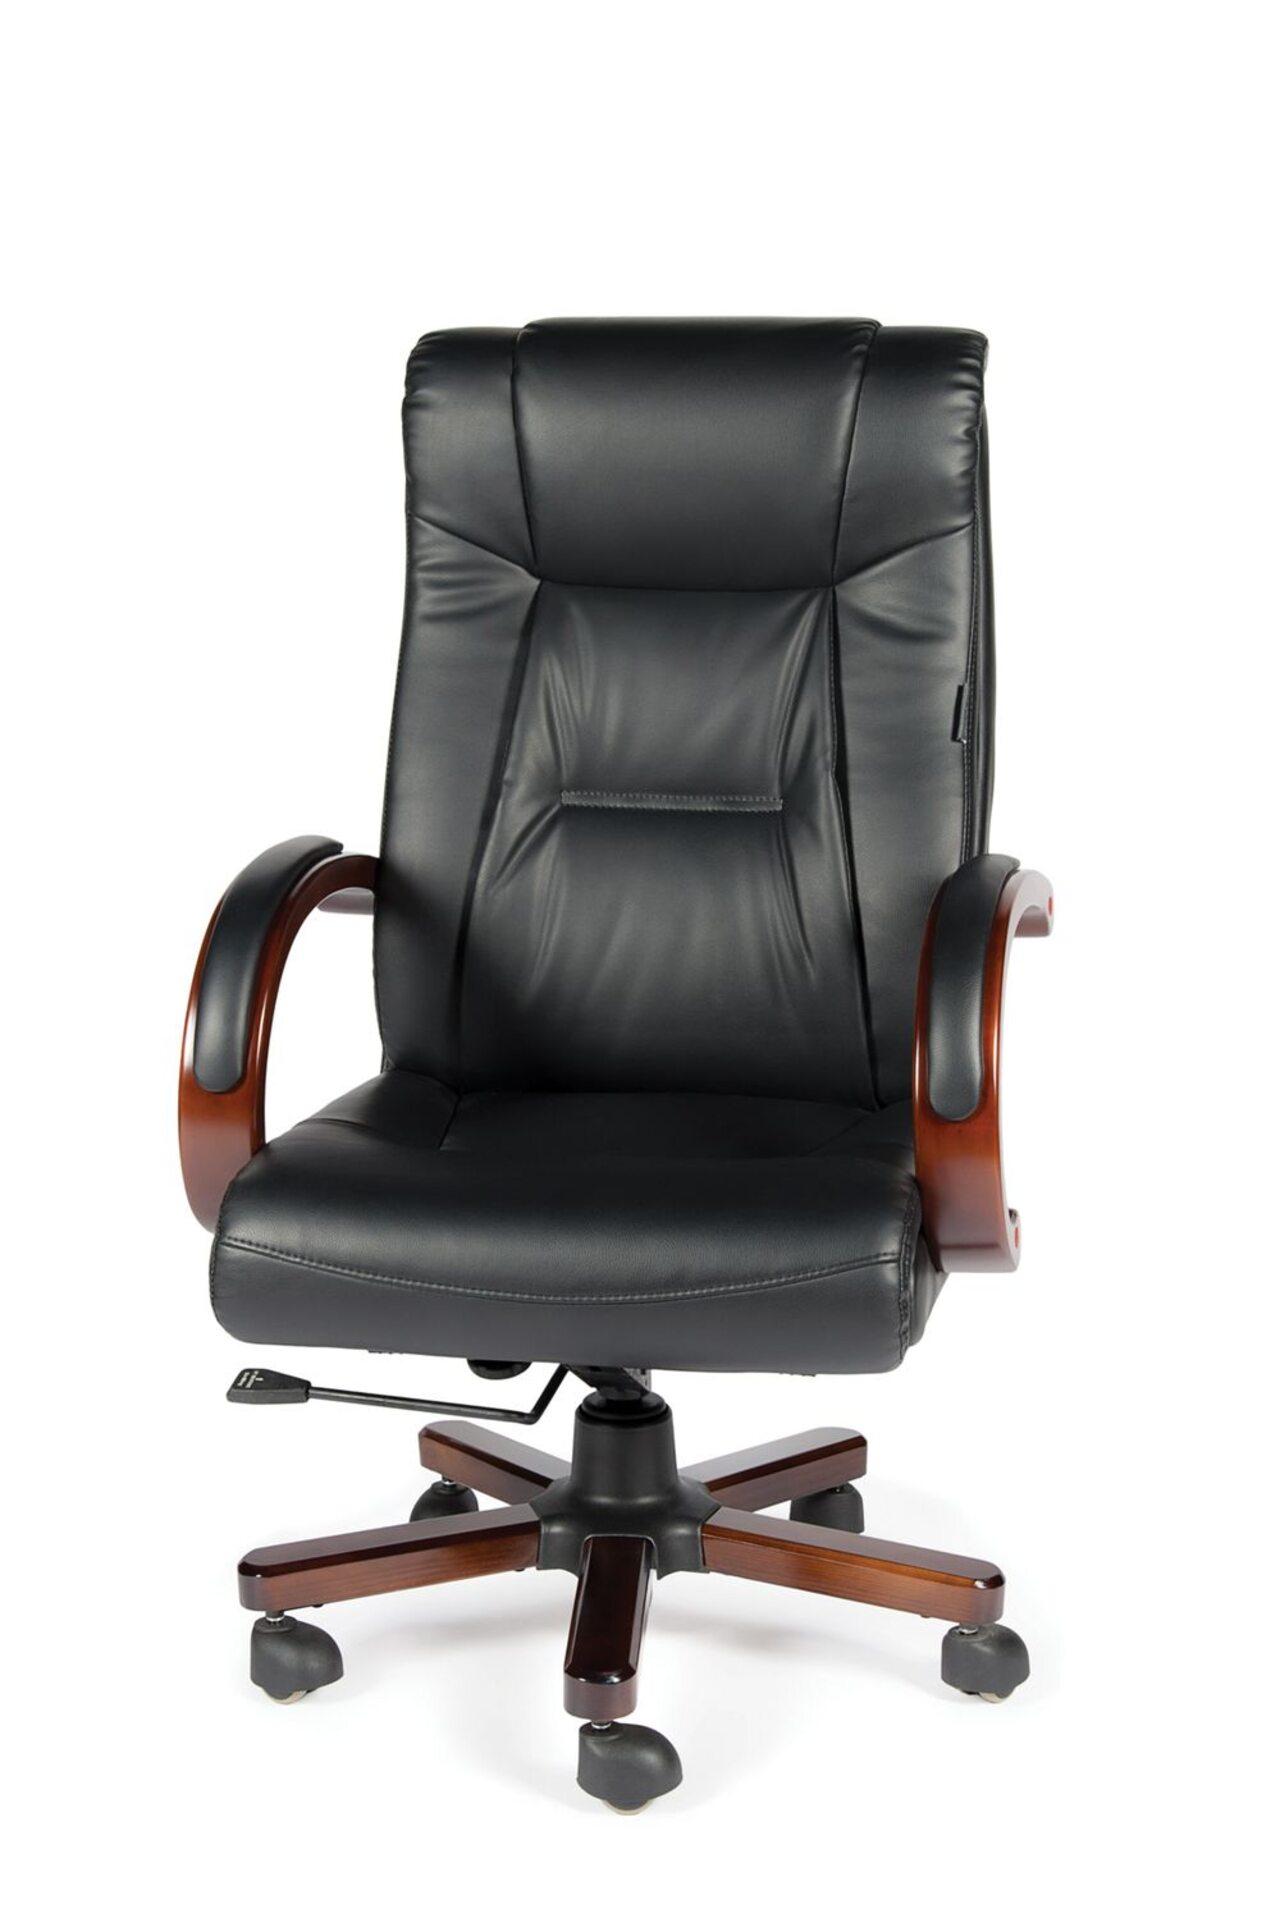 Кресло руководителя Консул 3158-02 - фото 5